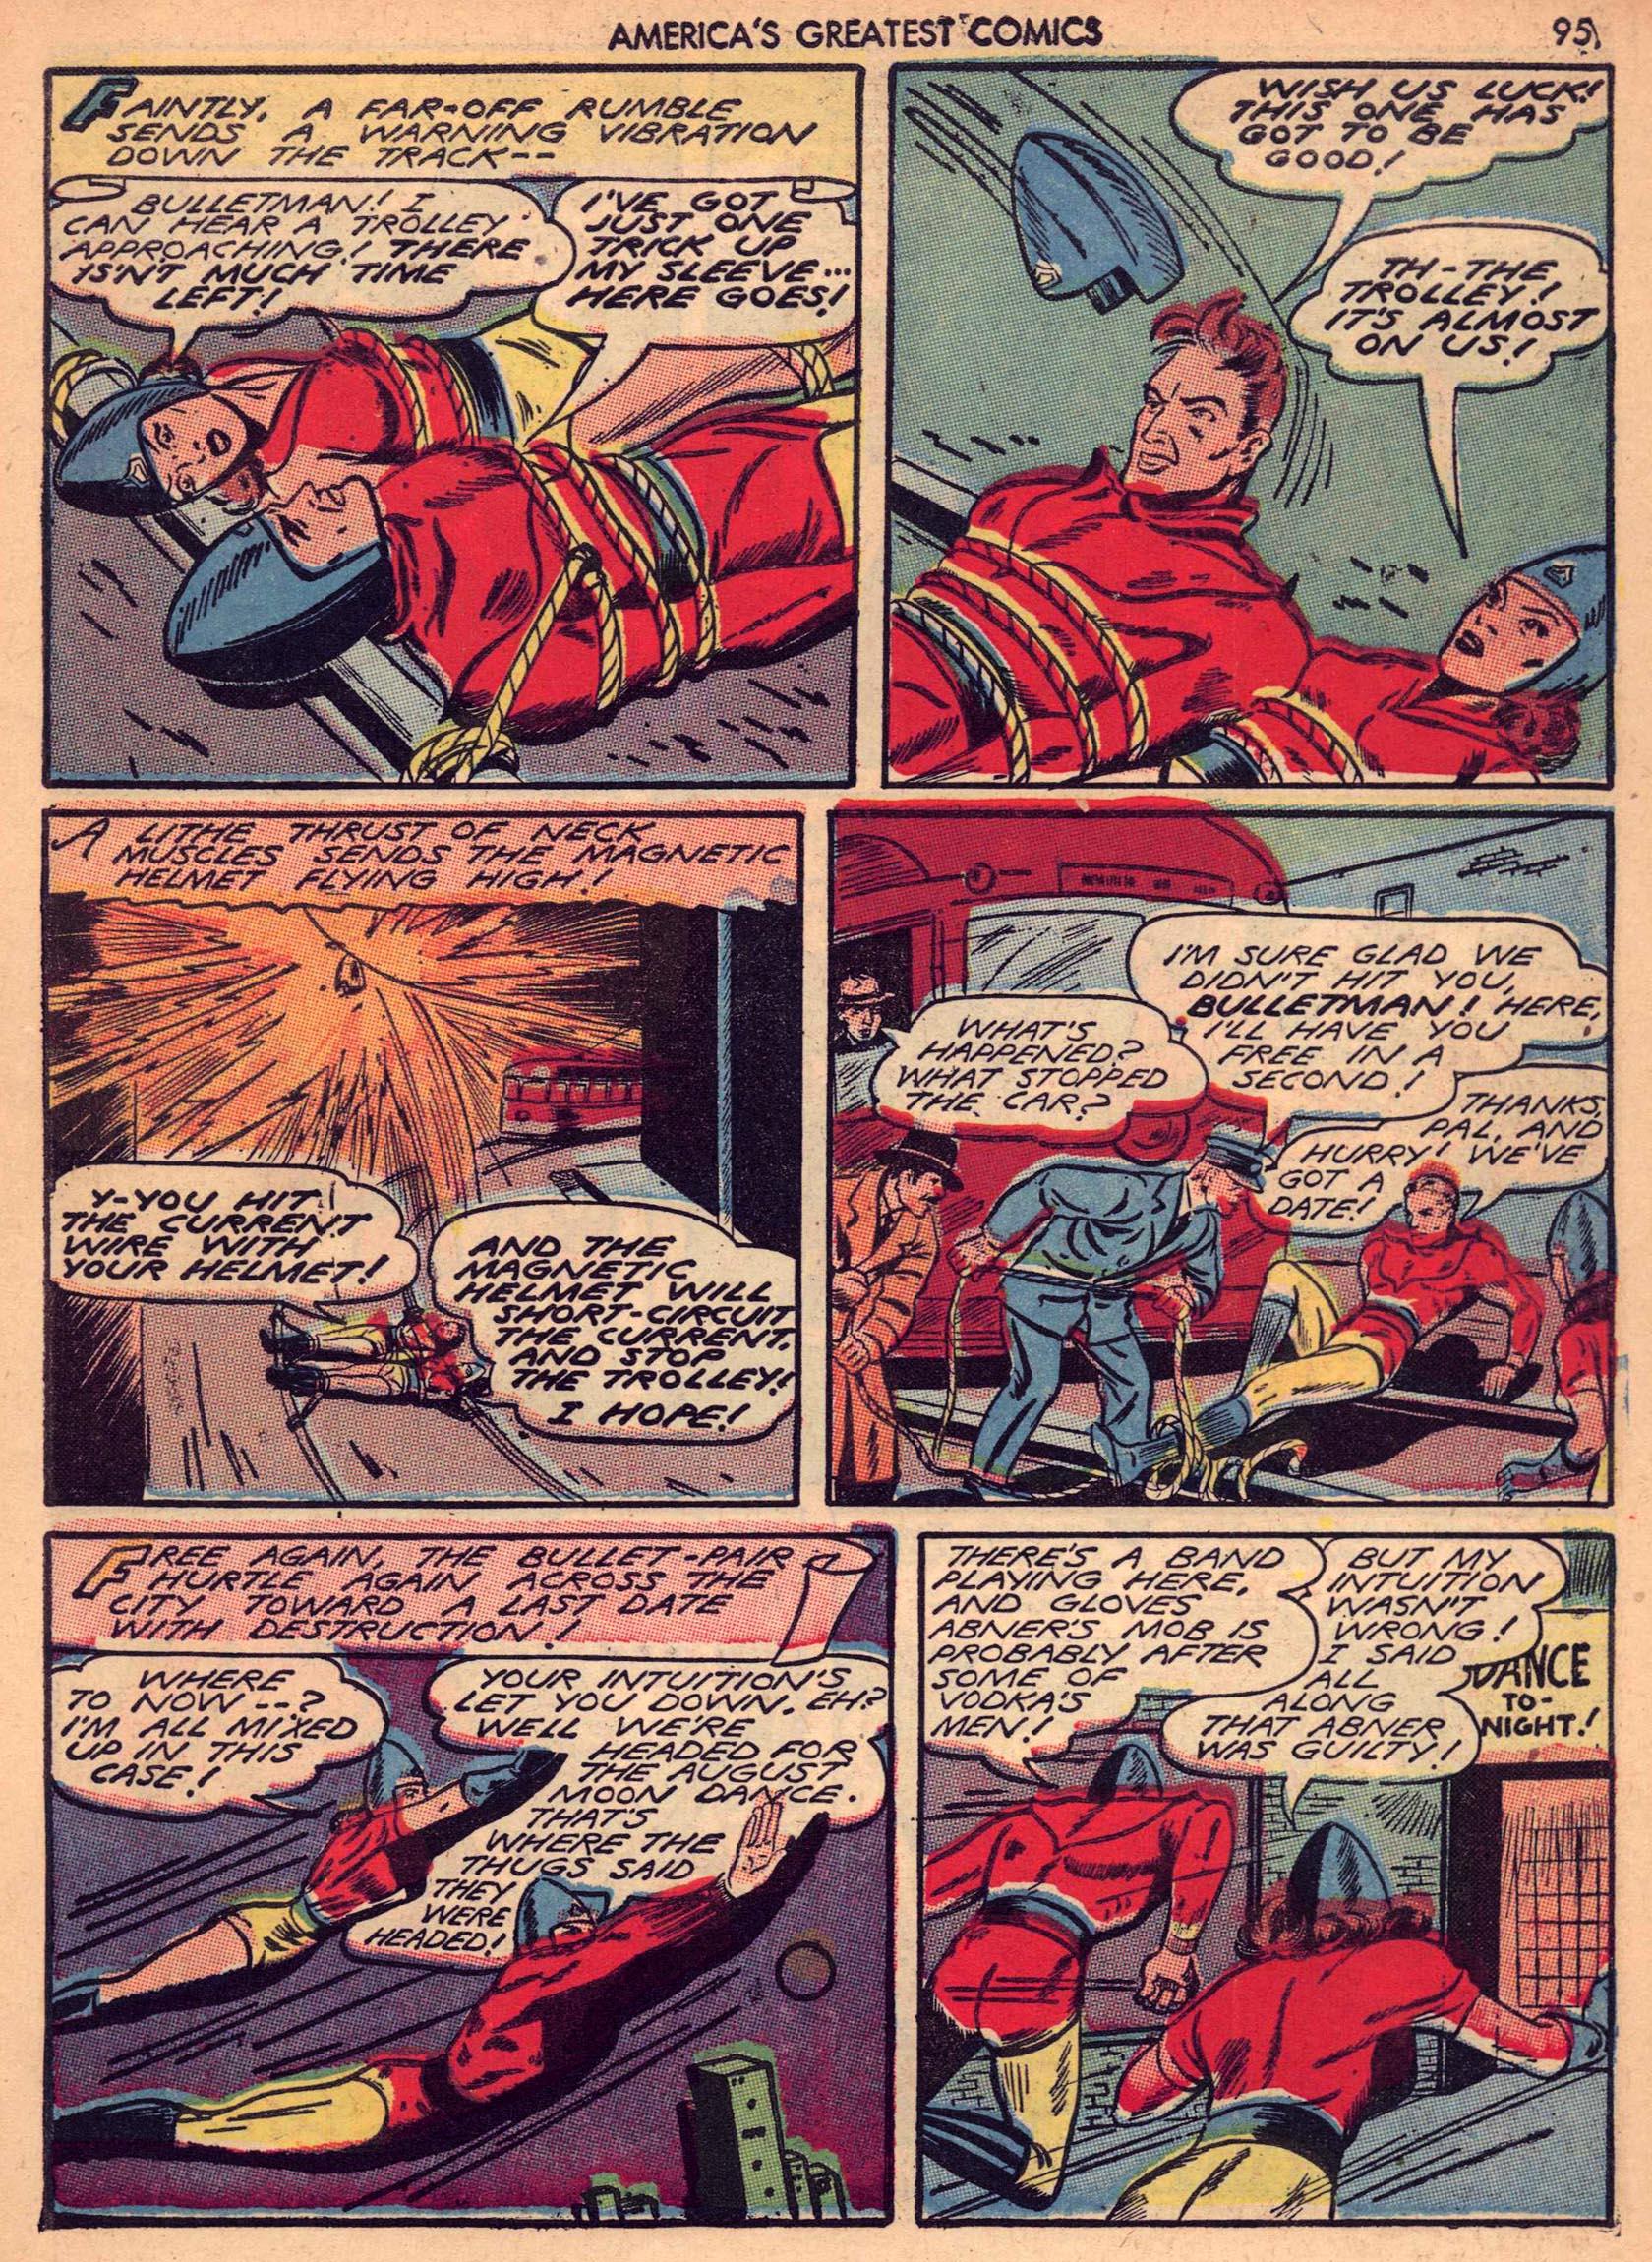 Read online America's Greatest Comics comic -  Issue #7 - 94